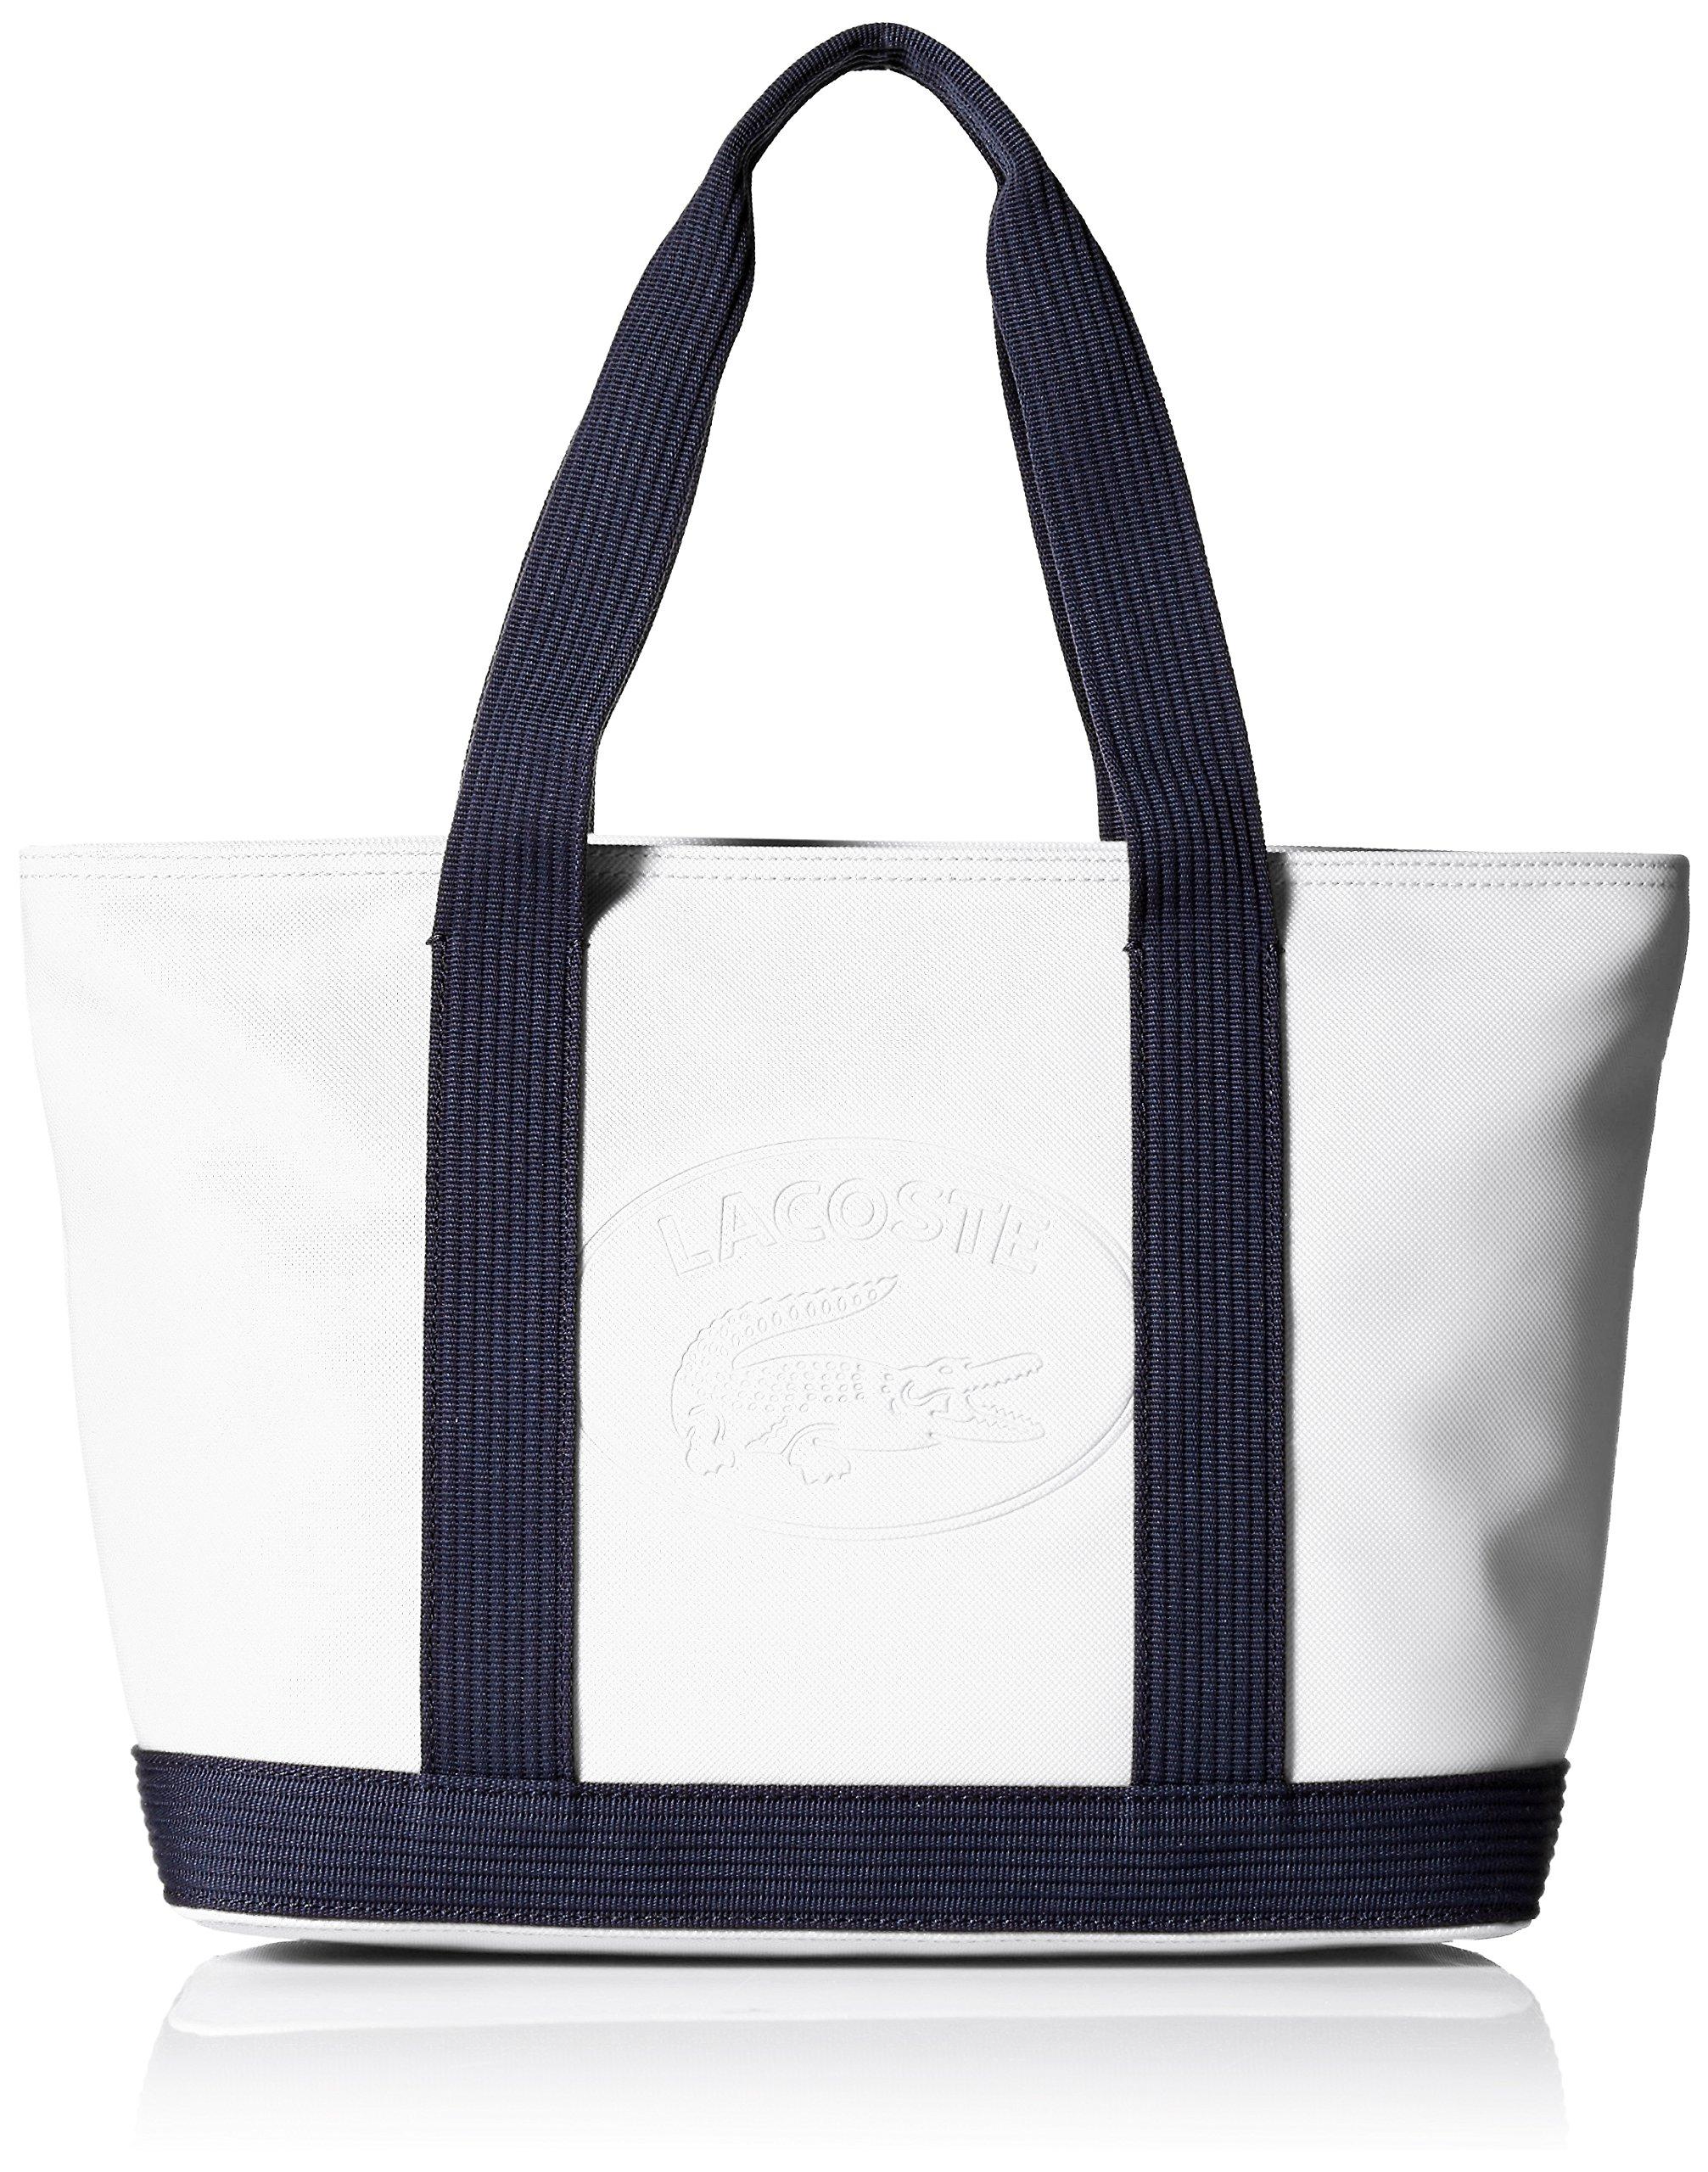 Lacoste Medium Shopping Bag, Nf2416wm, White Peacoat